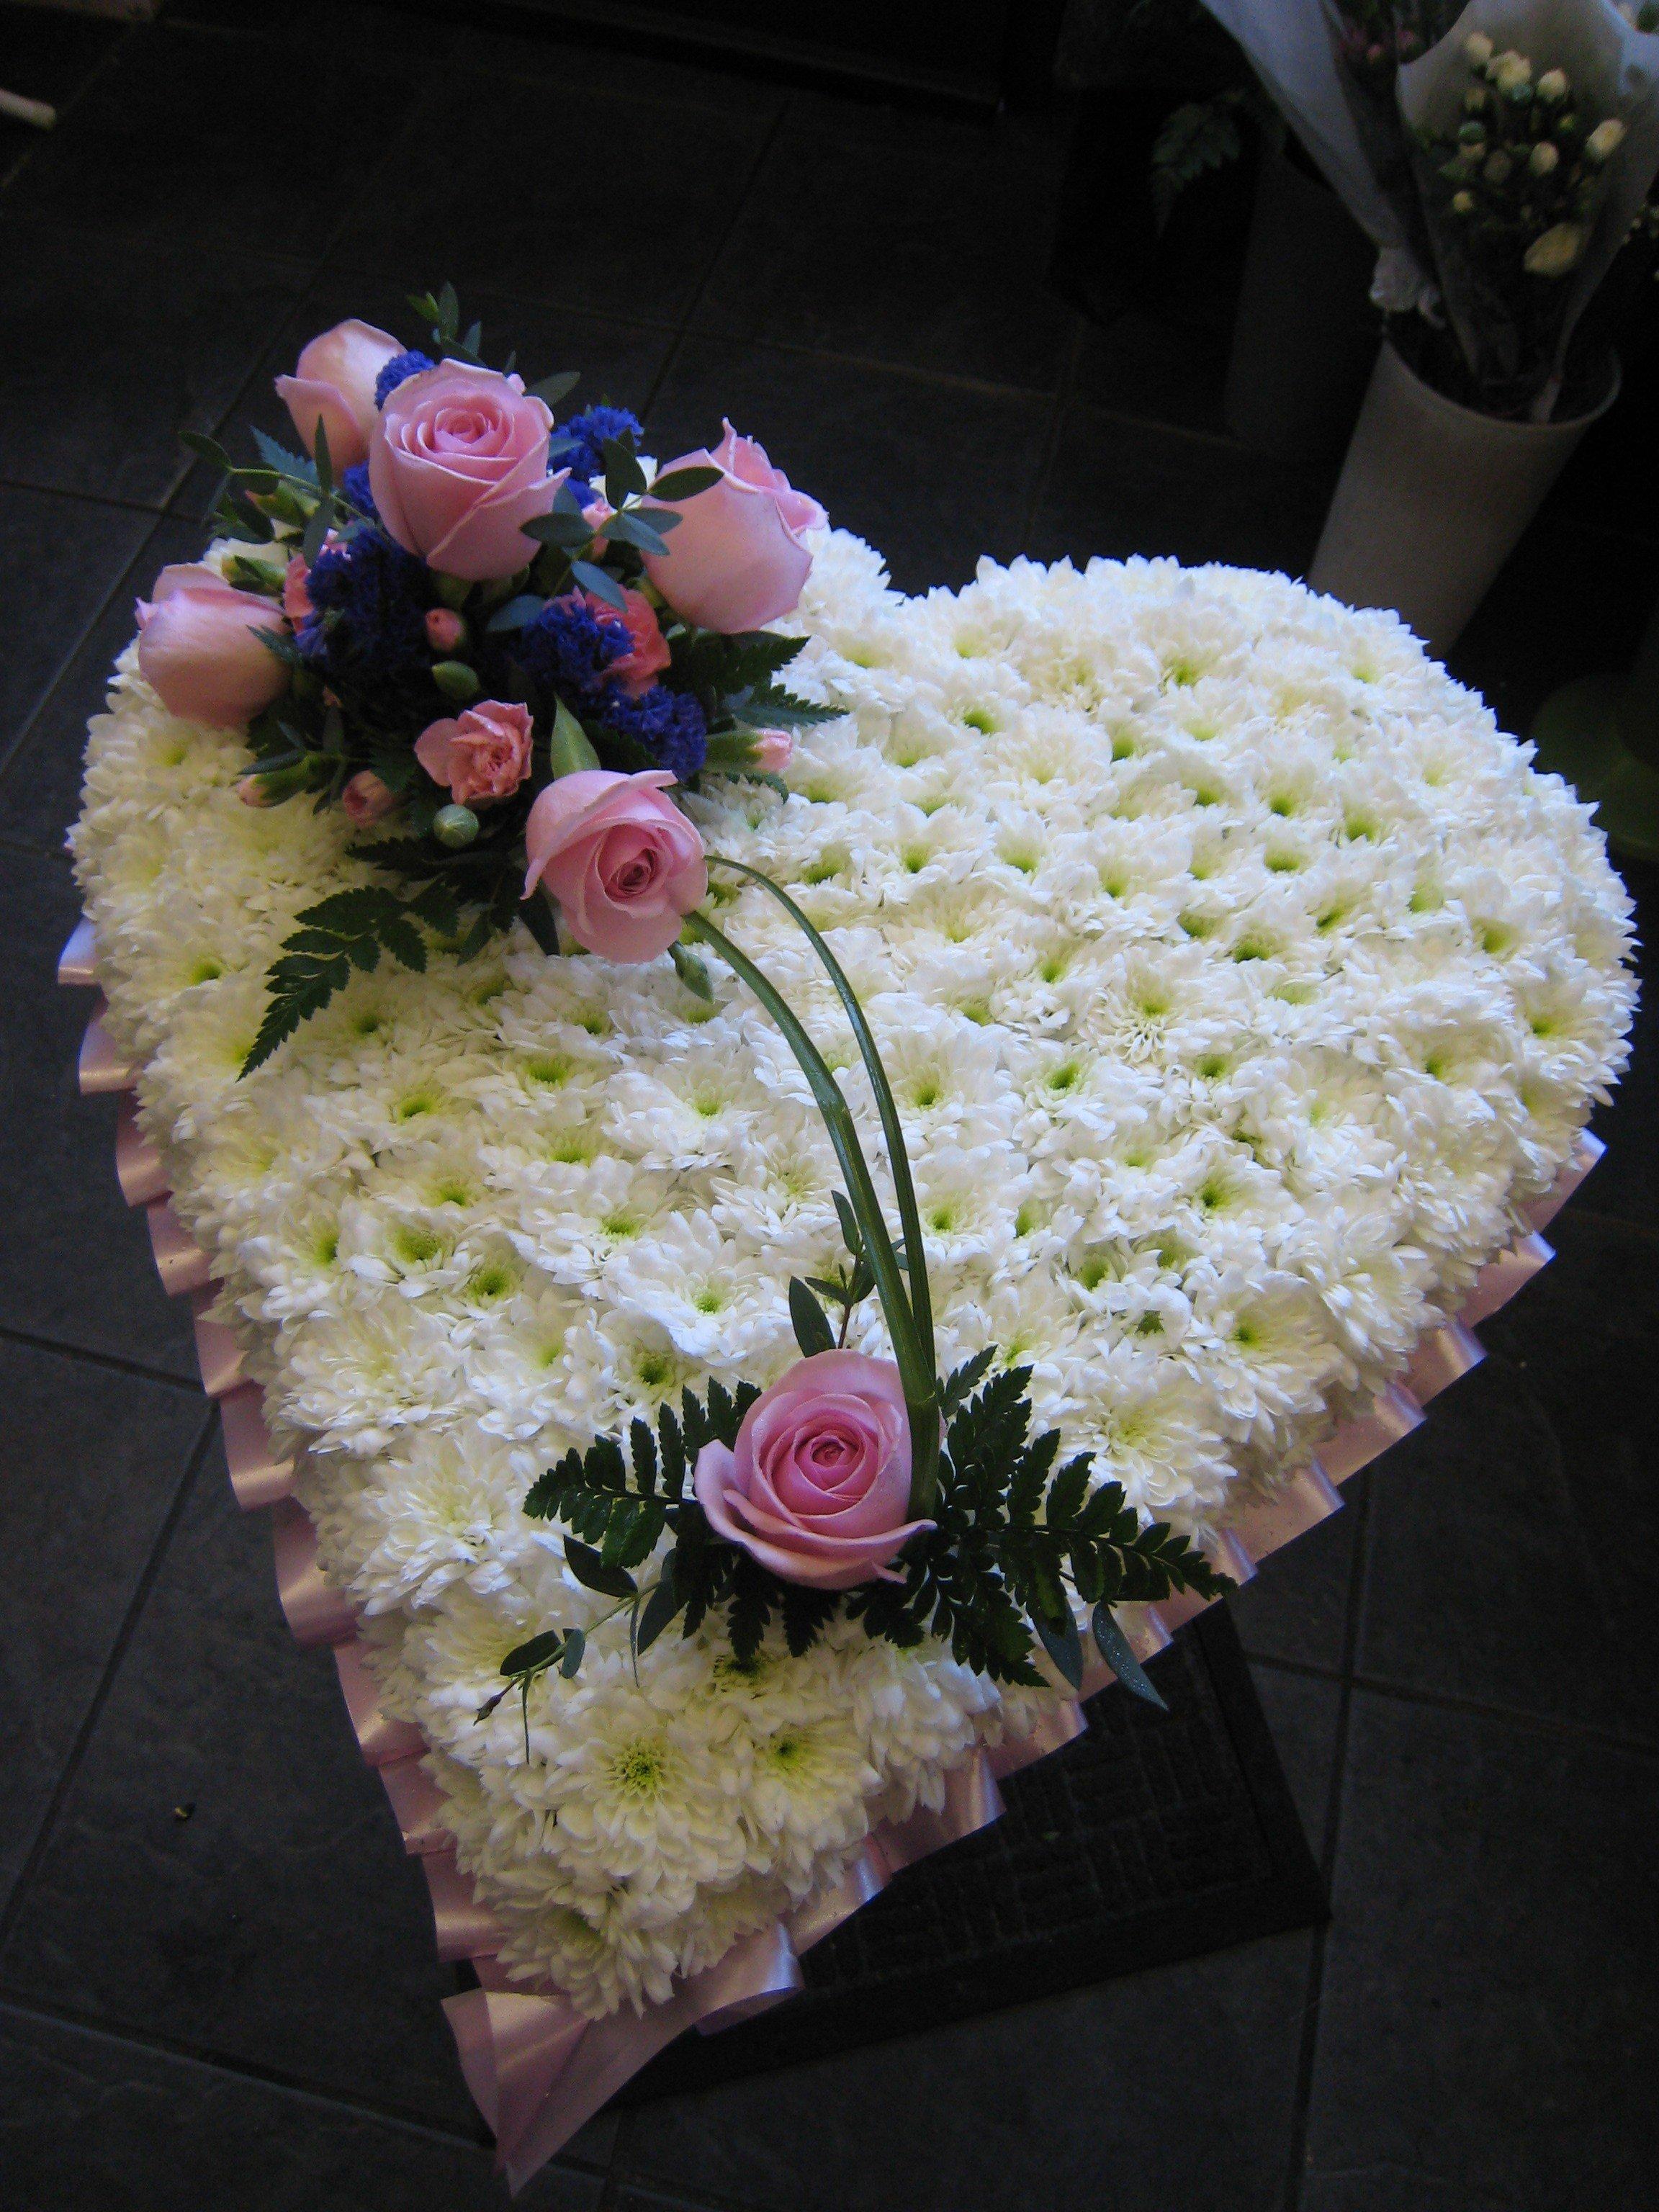 Jacaranda flowers hearts cushions pillow funeral tributes img2715 izmirmasajfo